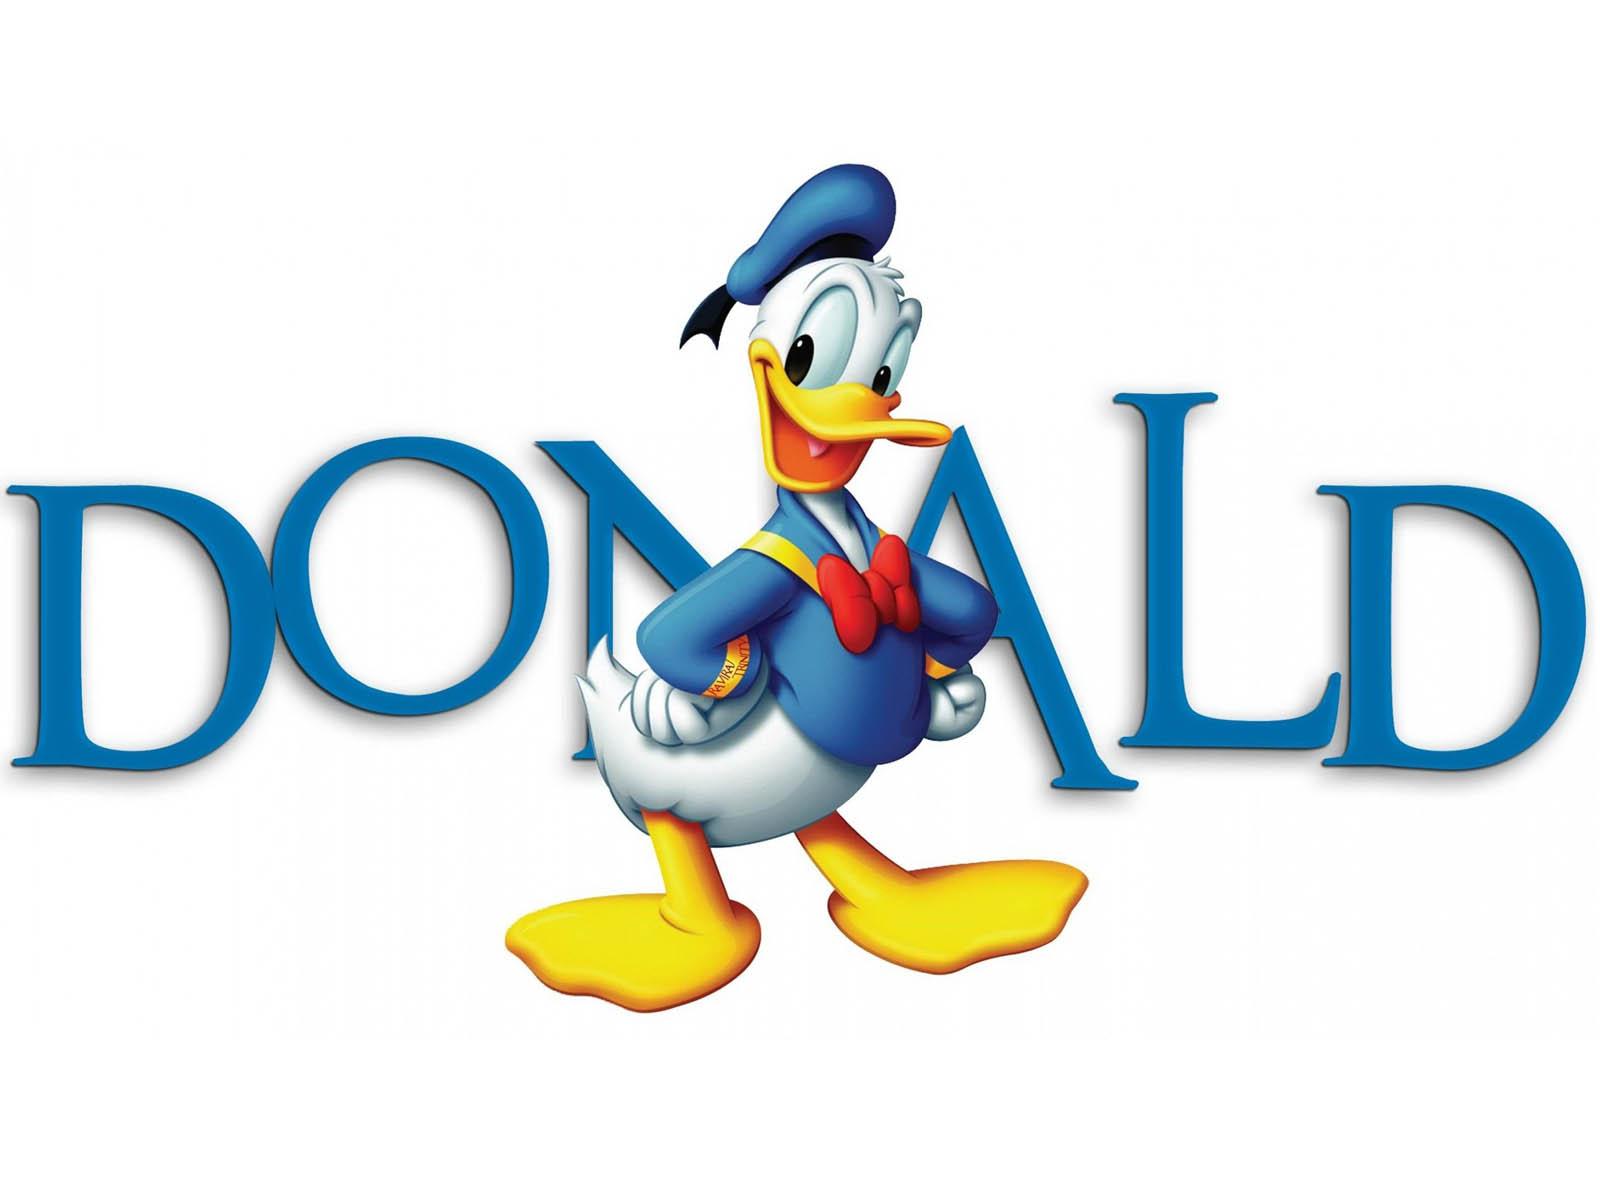 Donald duck hd wallpapers free hd wallpapers - Donald duck wallpaper ...